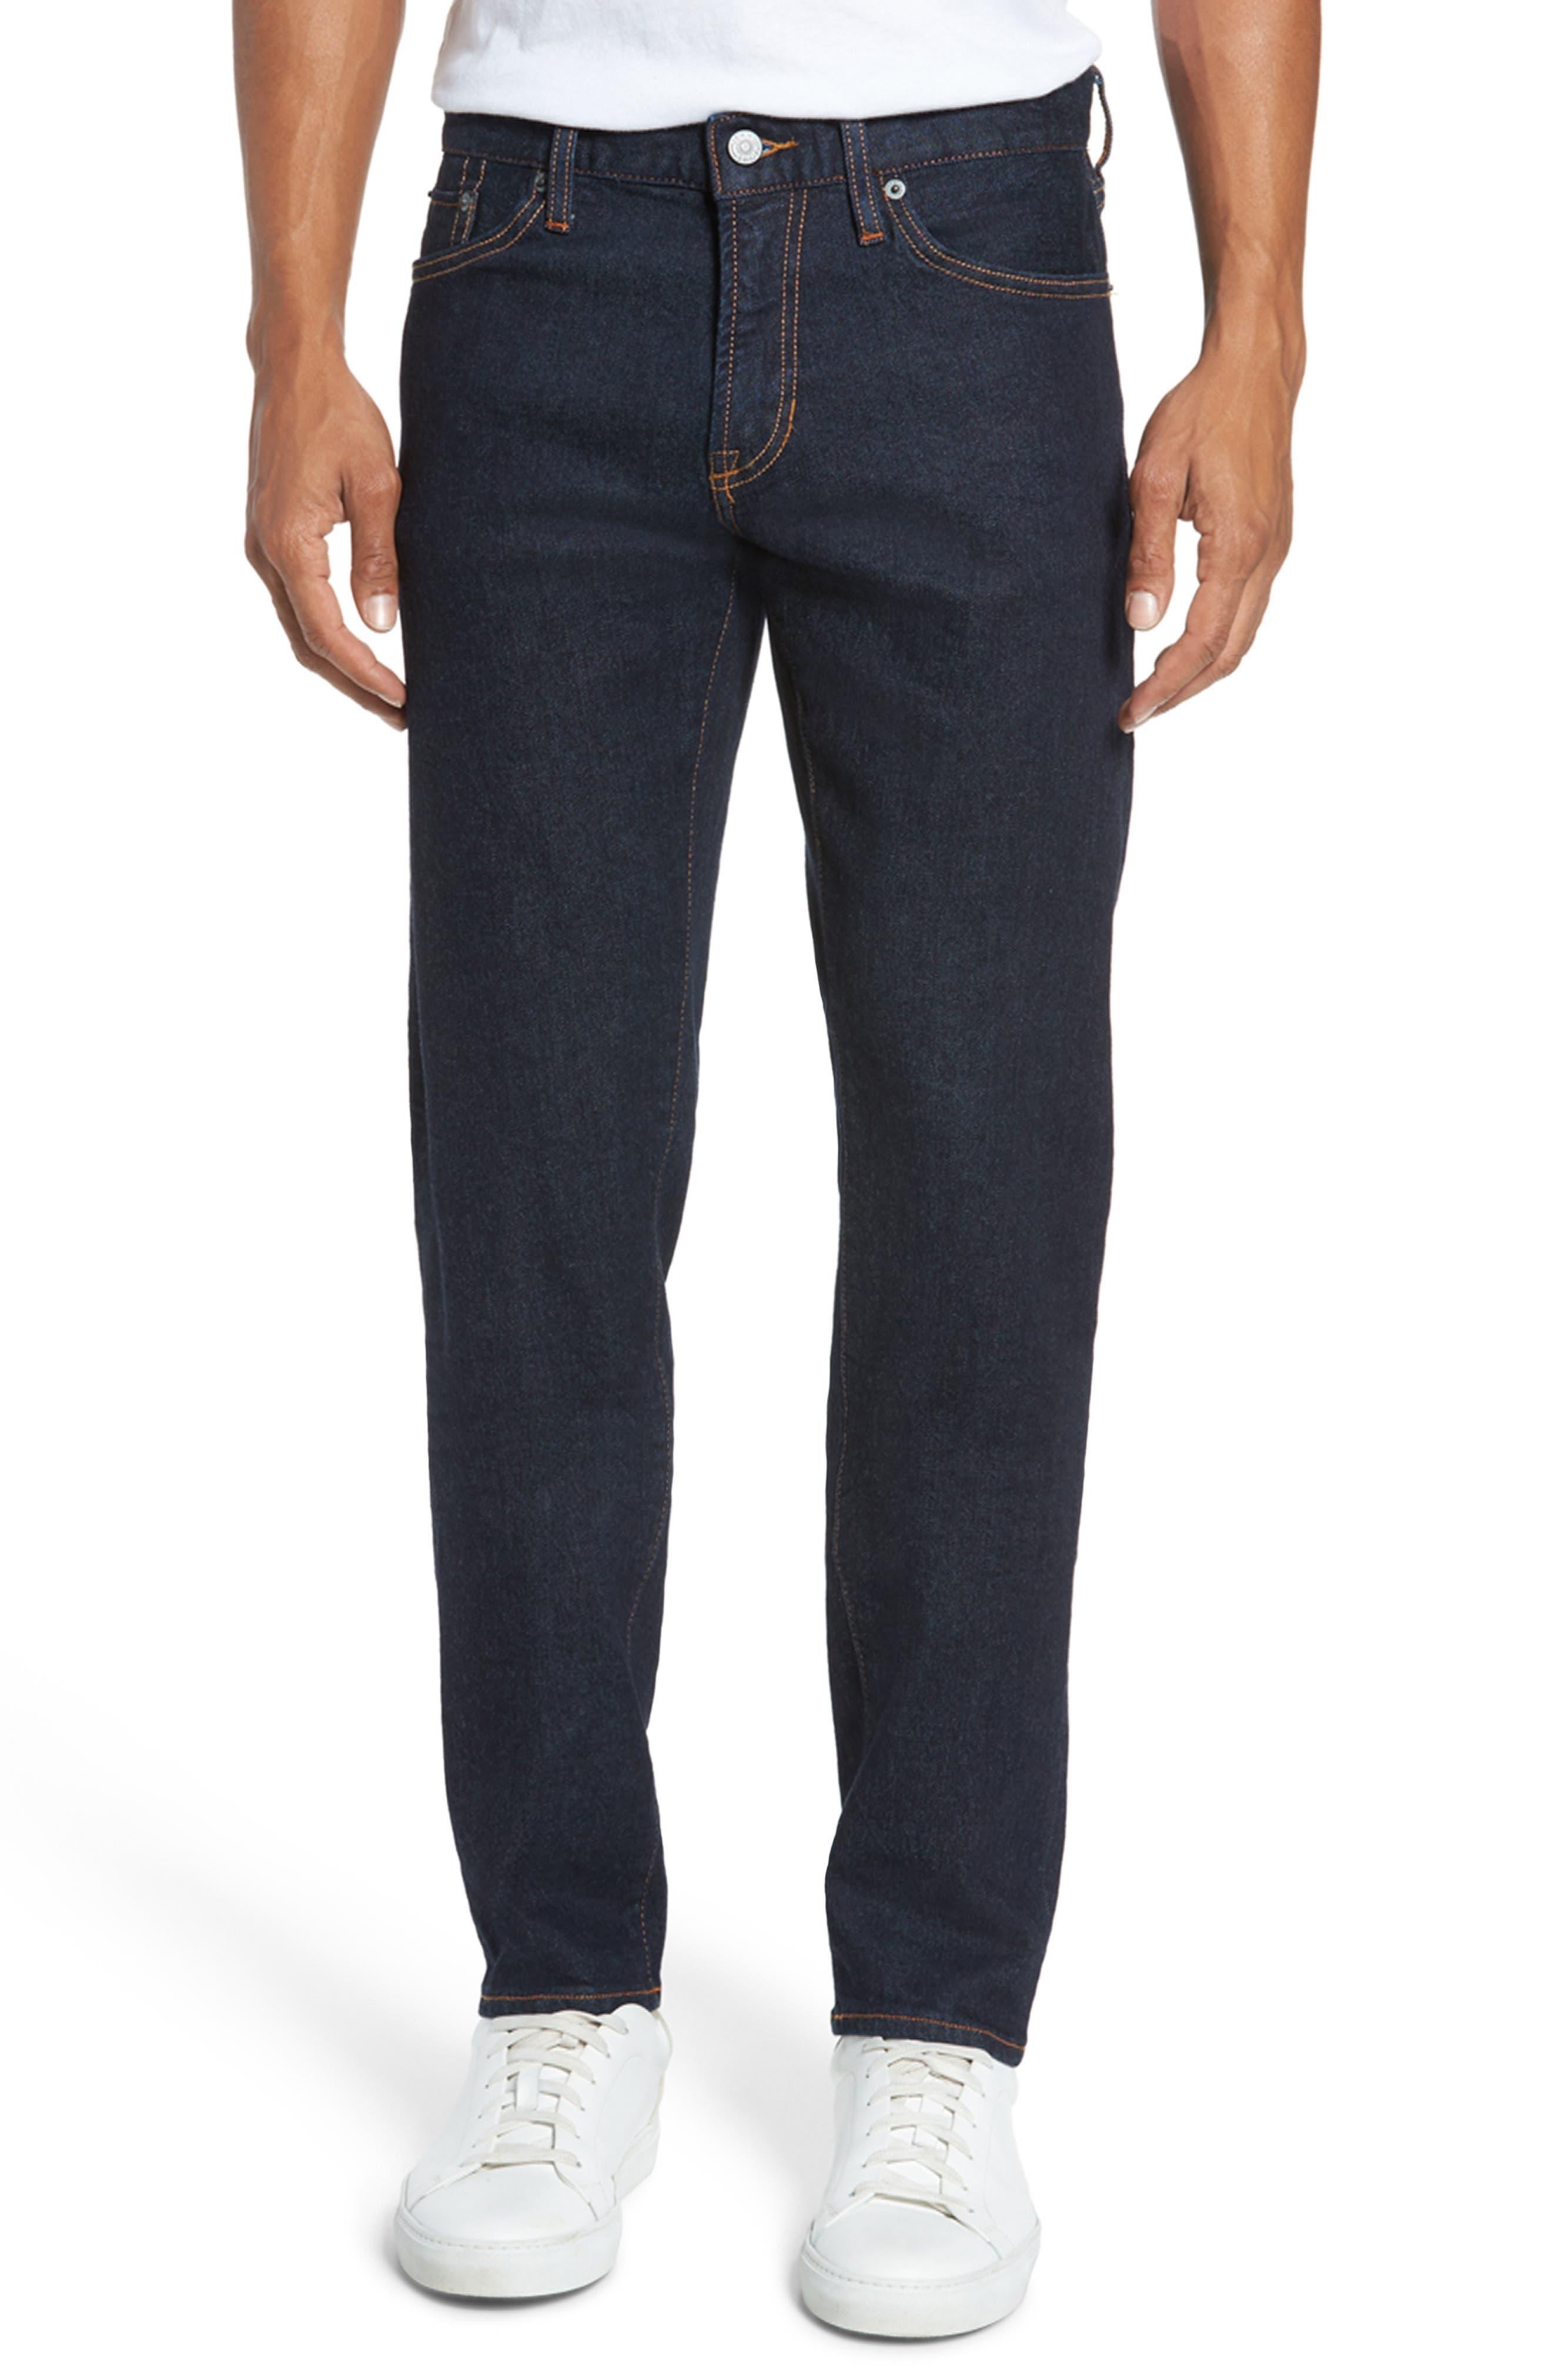 Jim Slim Fit Selvedge Jeans,                             Main thumbnail 1, color,                             Stretch Rinse